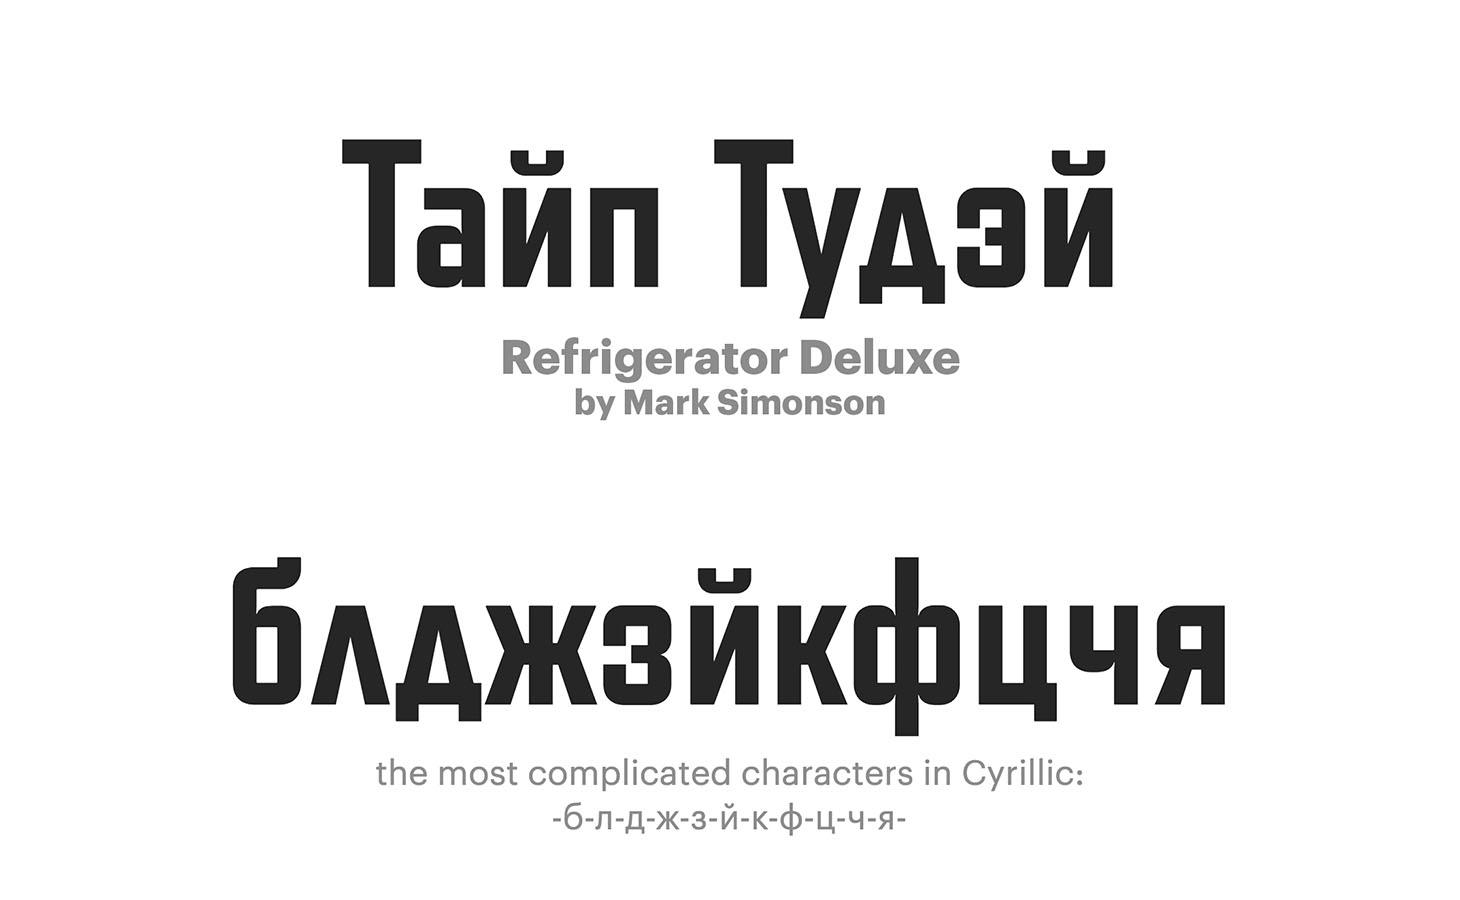 Refrigerator-Deluxe